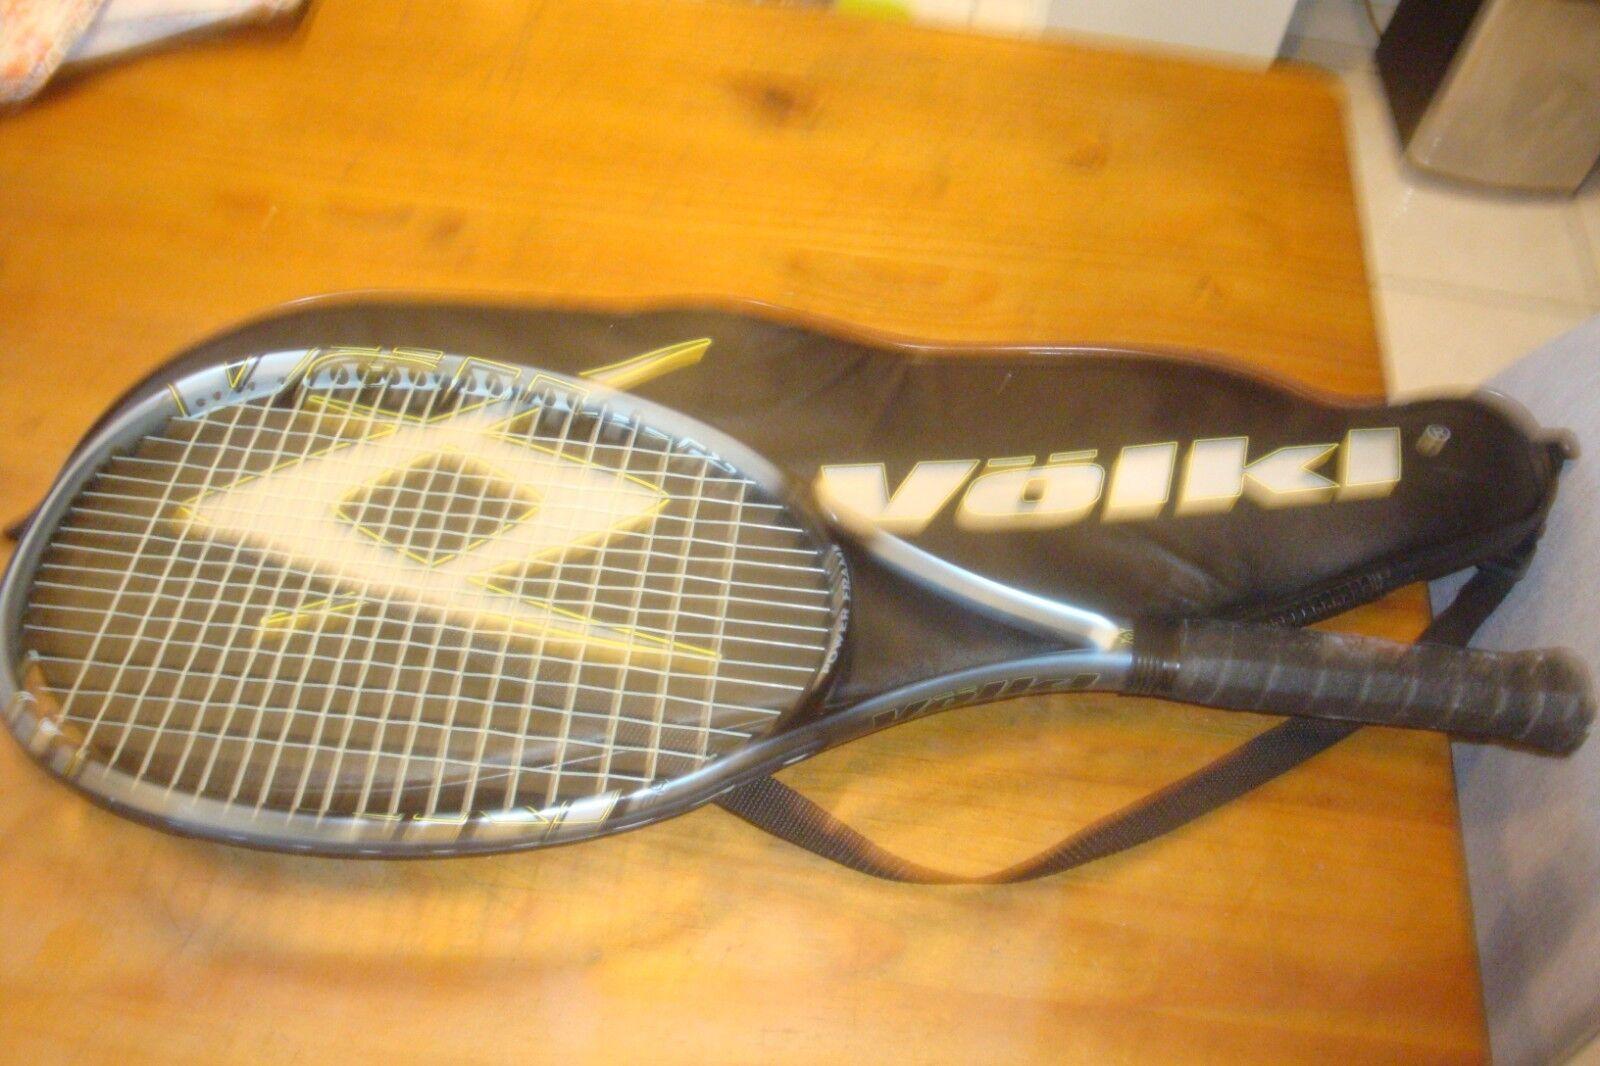 VOLKL HS1 Hot Spot Titanium 102 Mid Plus Tennis Racquet 4 1 2   VERY GOOD